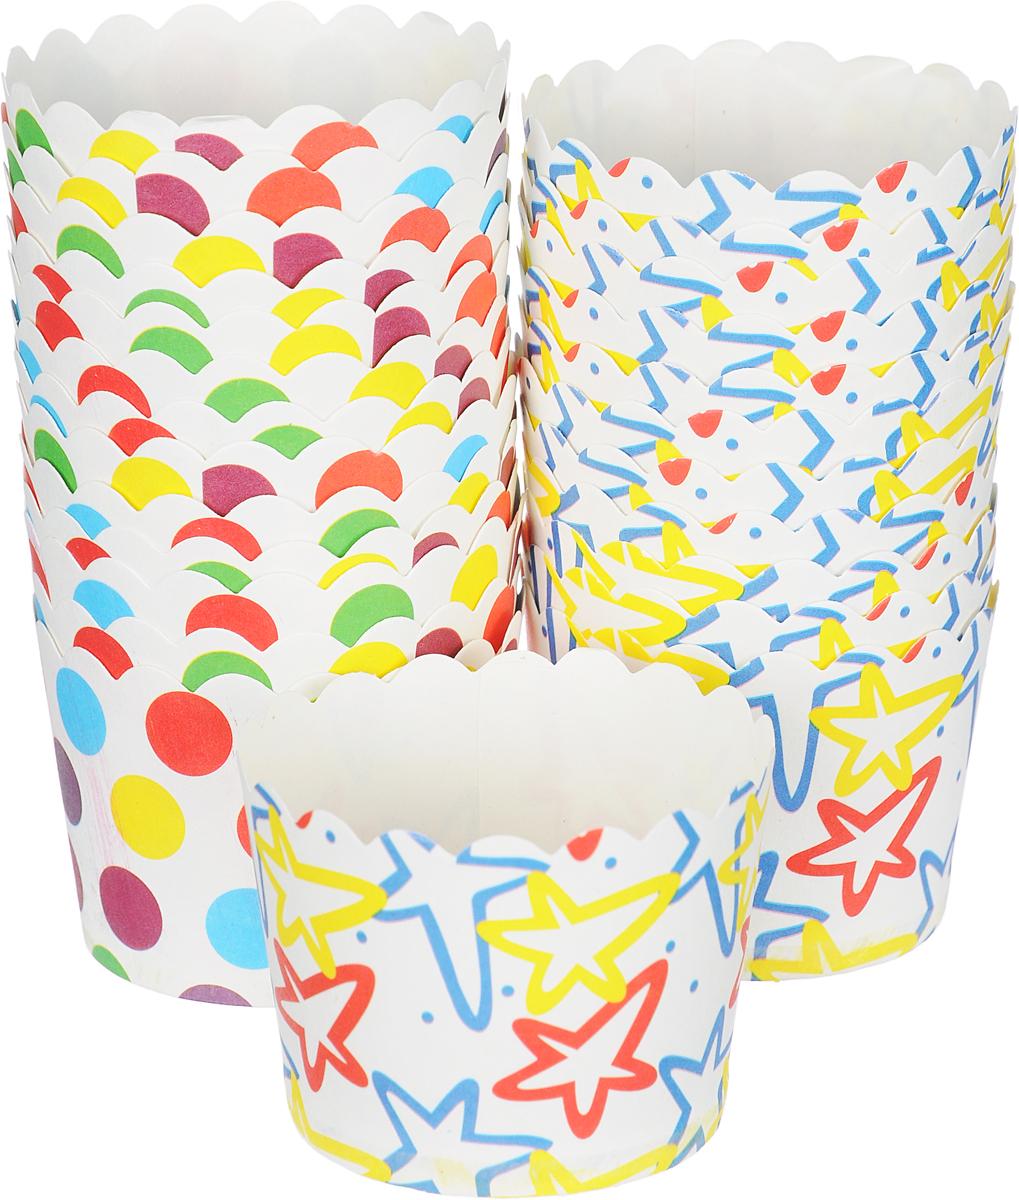 Набор форм для выпечки кексов Marmiton Люкс, цвет: мультиколор, 24 шт17054_мультиколлорНабор форм для выпечки кексов Marmiton Люкс, цвет: мультиколор, 24 шт